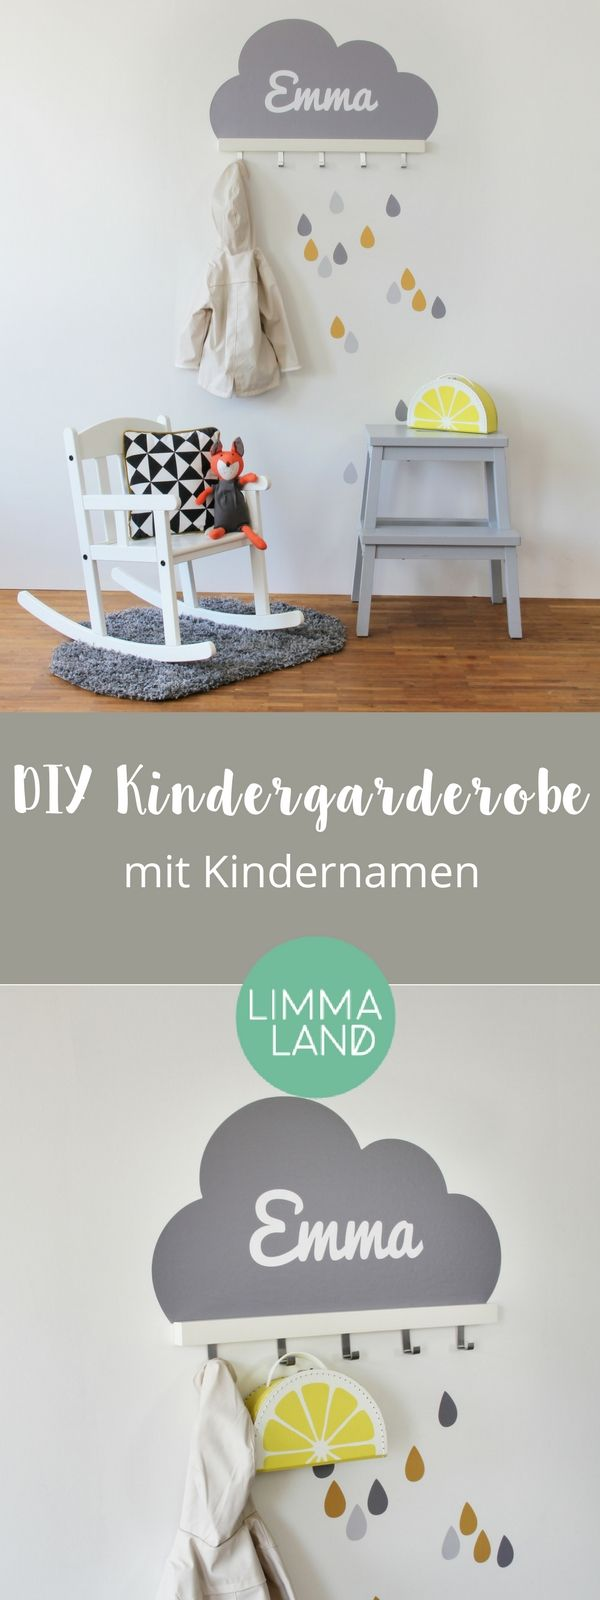 best 25 ikea kids bedroom ideas on pinterest kids bedroom storage ikea hack kids bedroom and. Black Bedroom Furniture Sets. Home Design Ideas